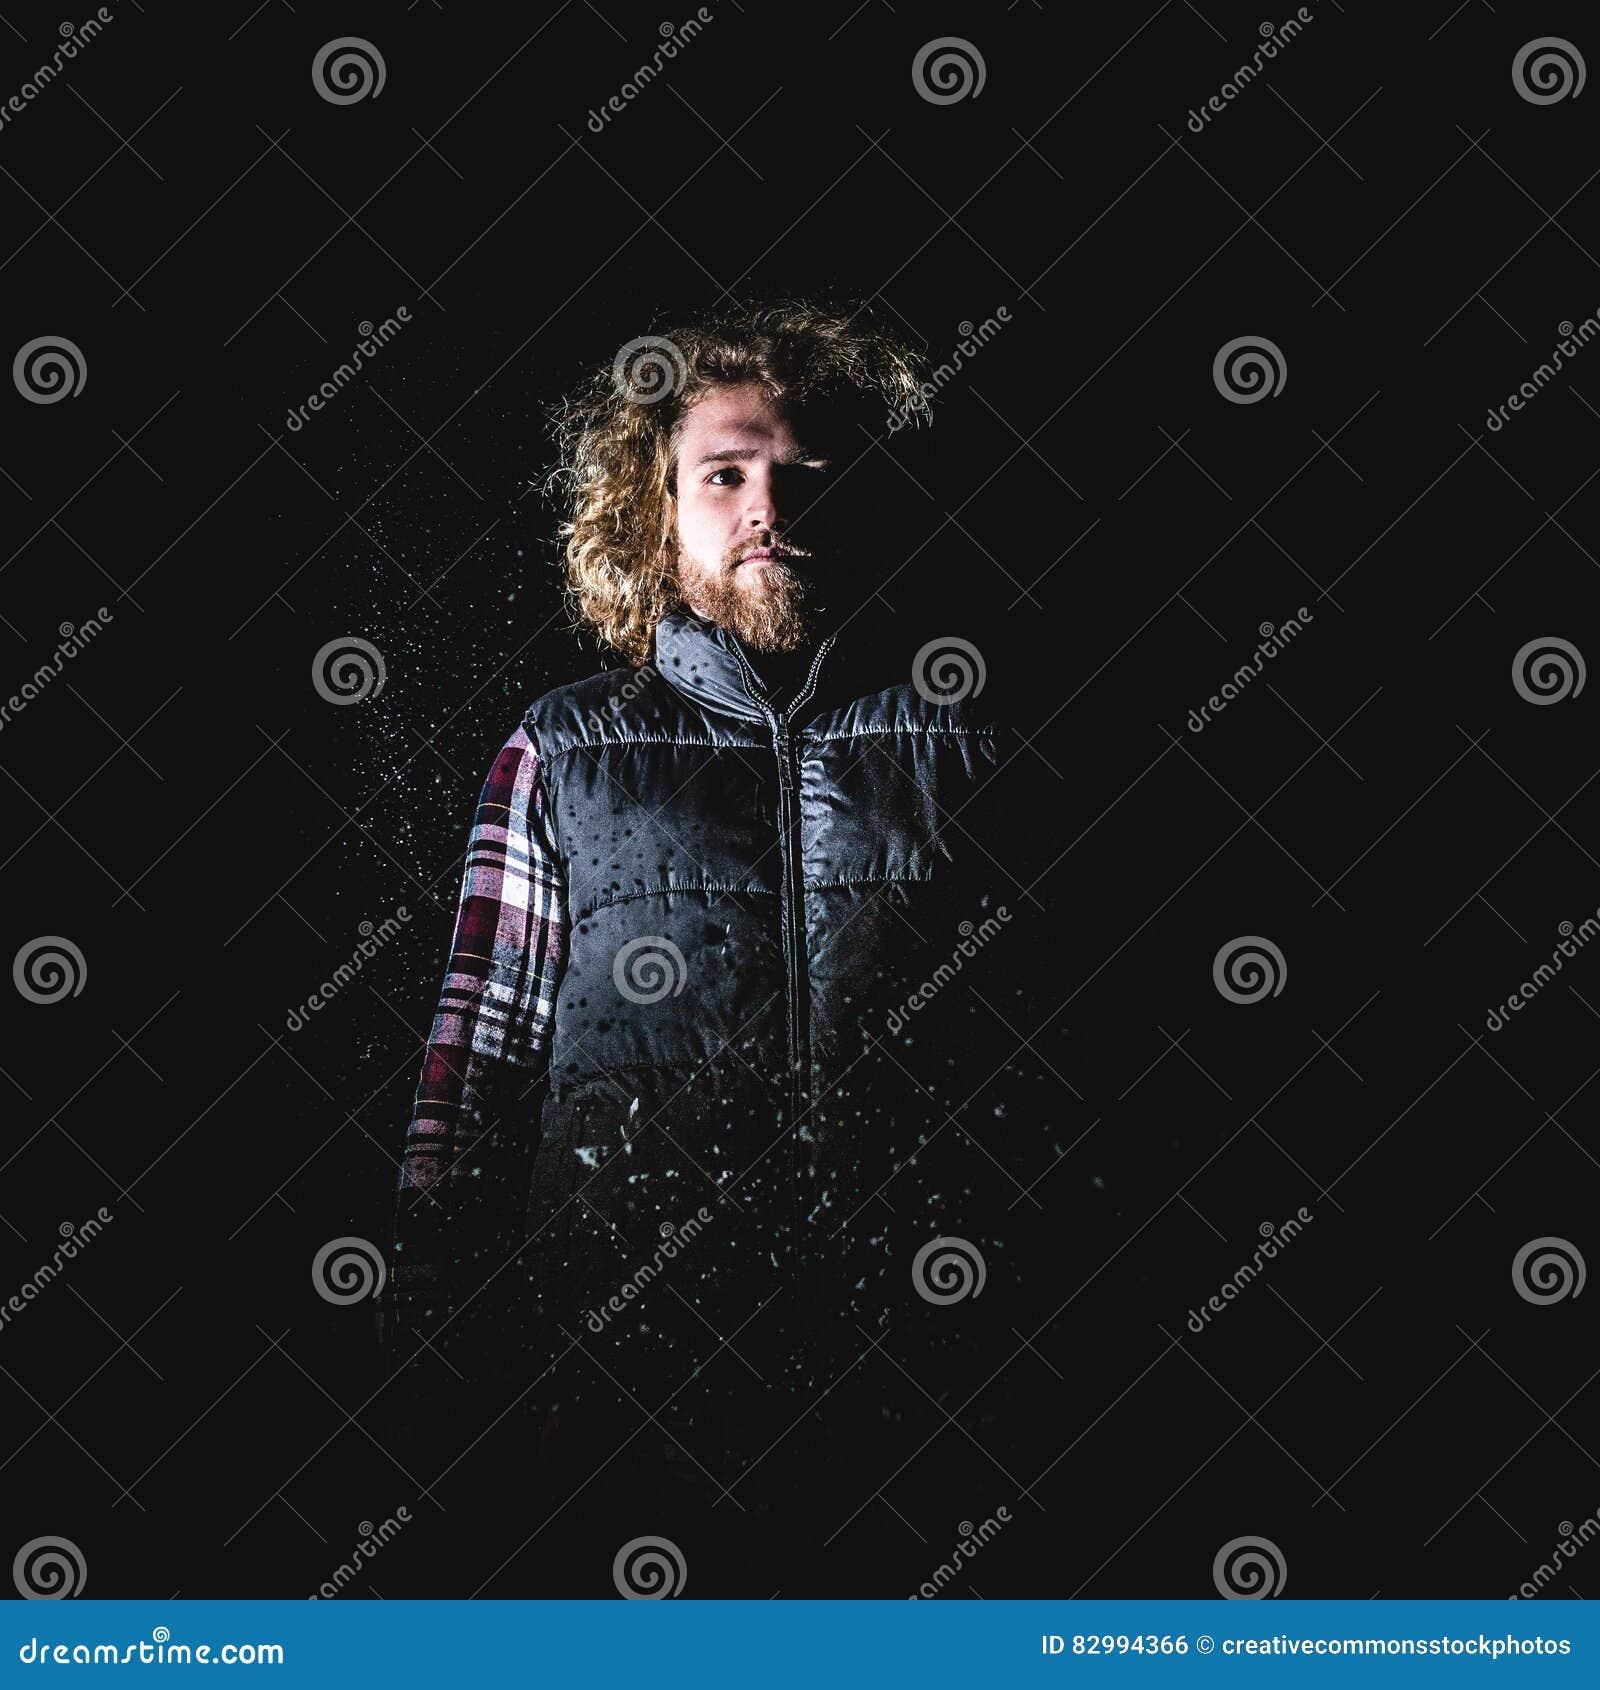 Man in Blond Hair Wearing Black Puffer Vest Standing